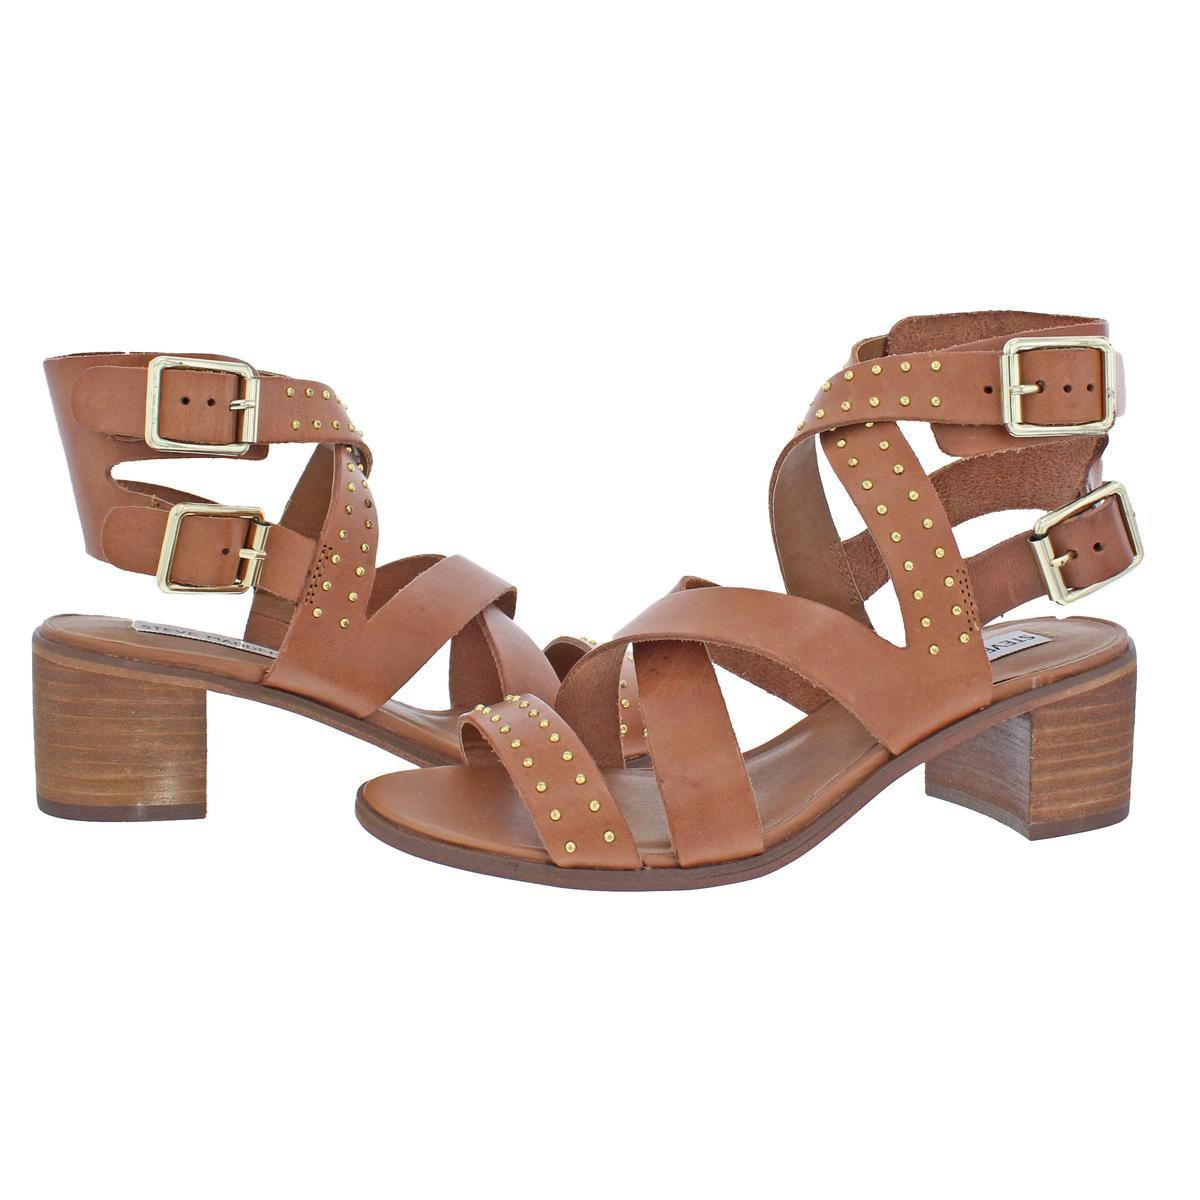 63c750cc7e7 Steve Madden - Brown Womens Adrien Open Toe Strappy Dress Sandals - Lyst.  View fullscreen